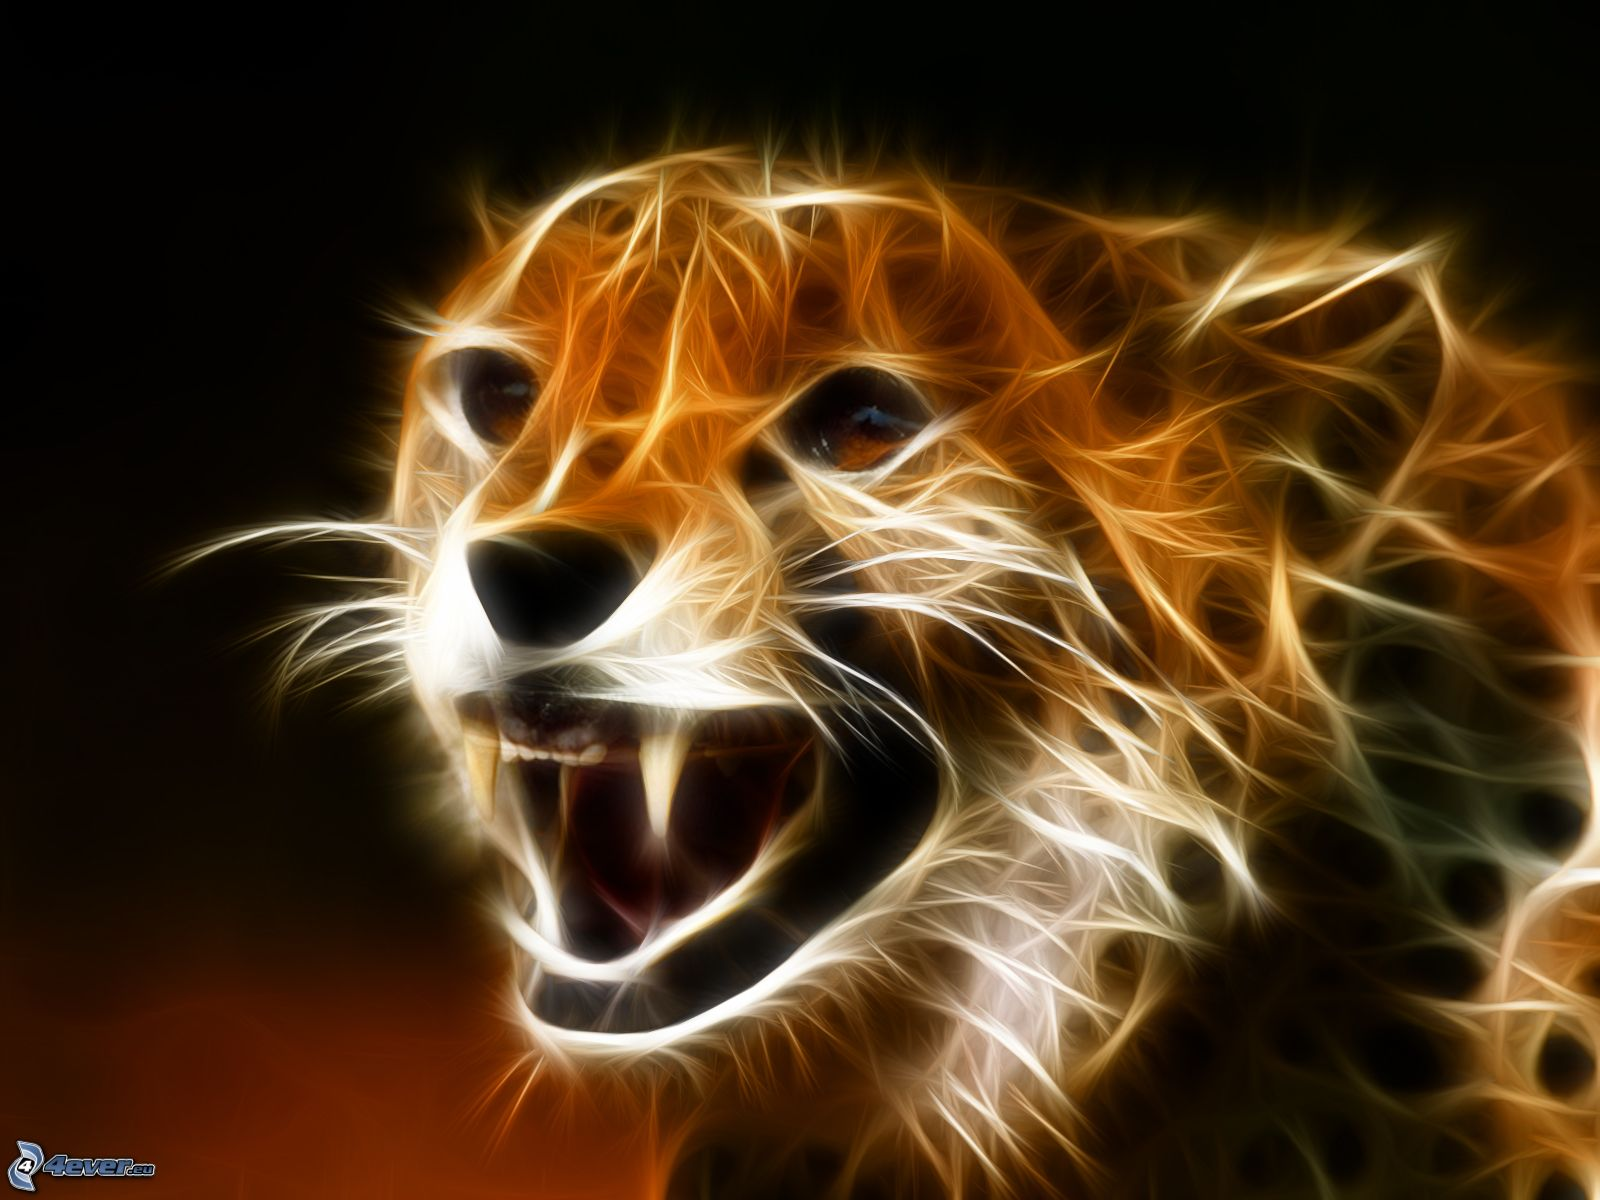 25 fractales de animales hd alguno va a gustarte taringa for Sfondi per desktop 3d